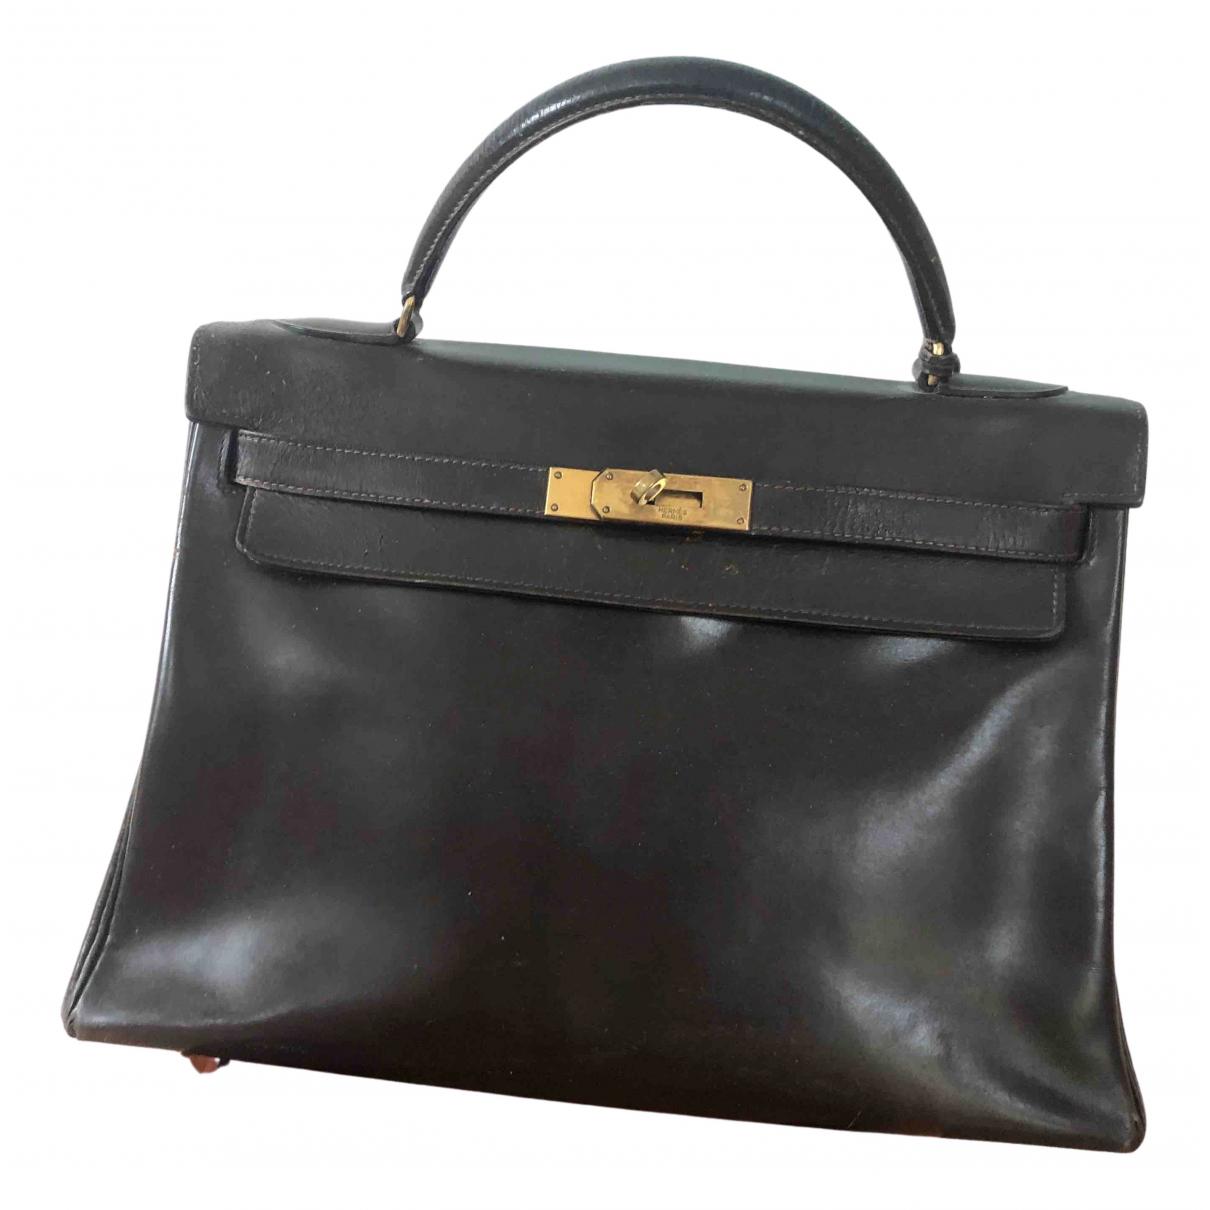 Hermes Kelly 32 Handtasche in  Braun Leder